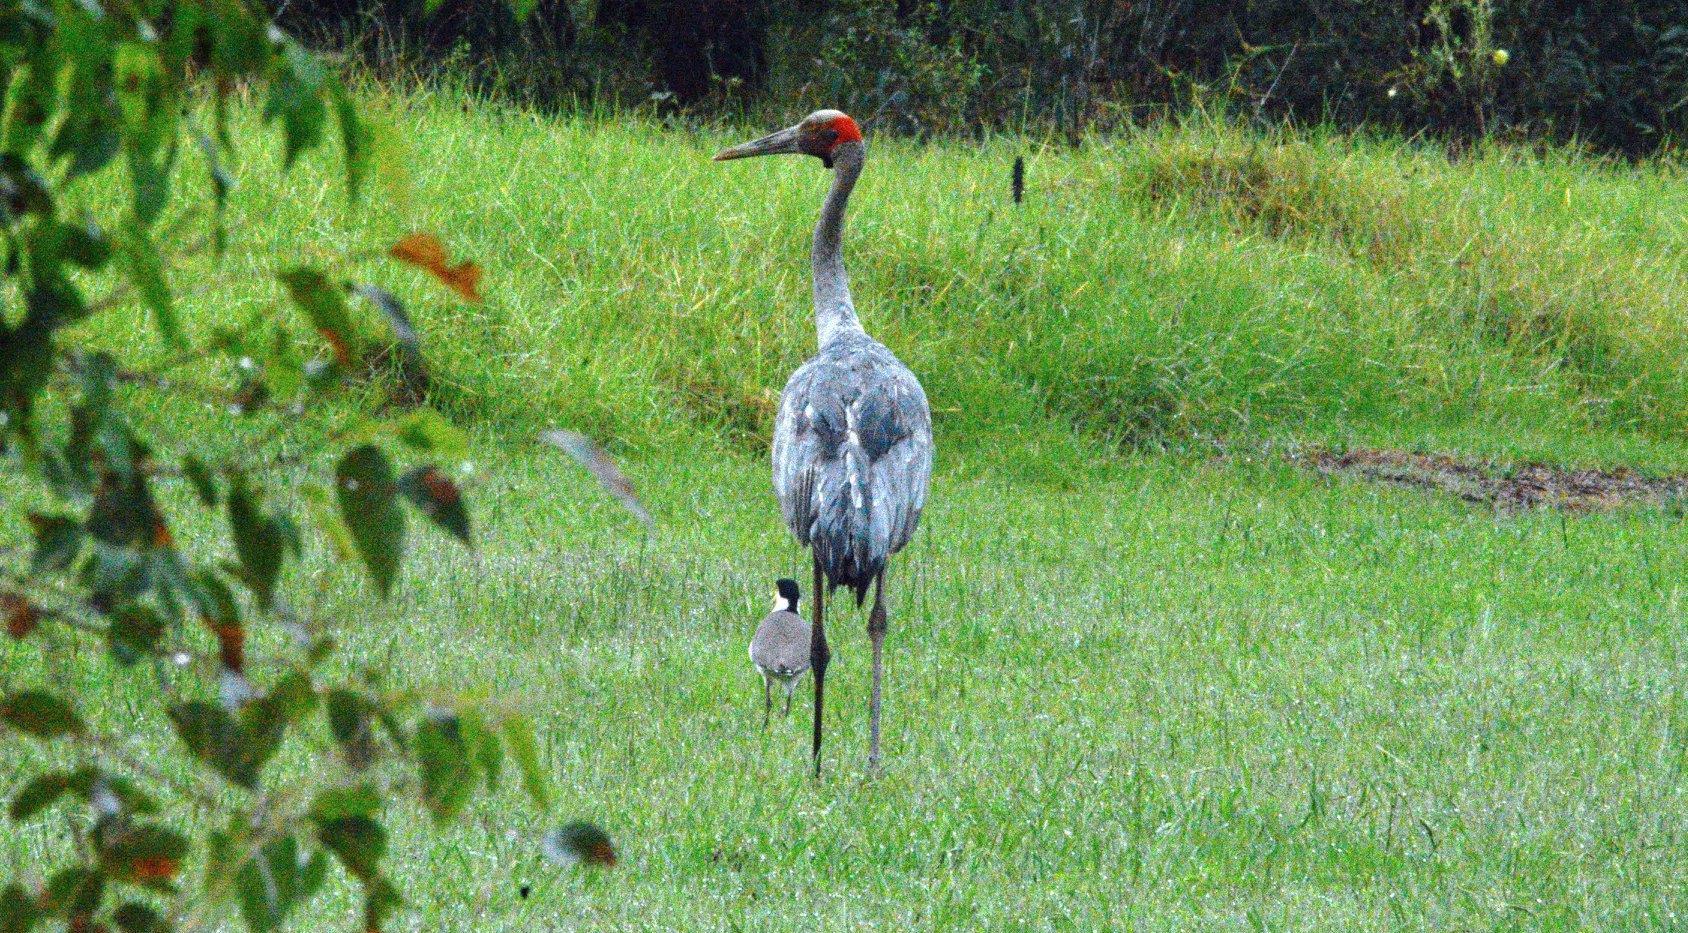 Brolga or Australian Crane